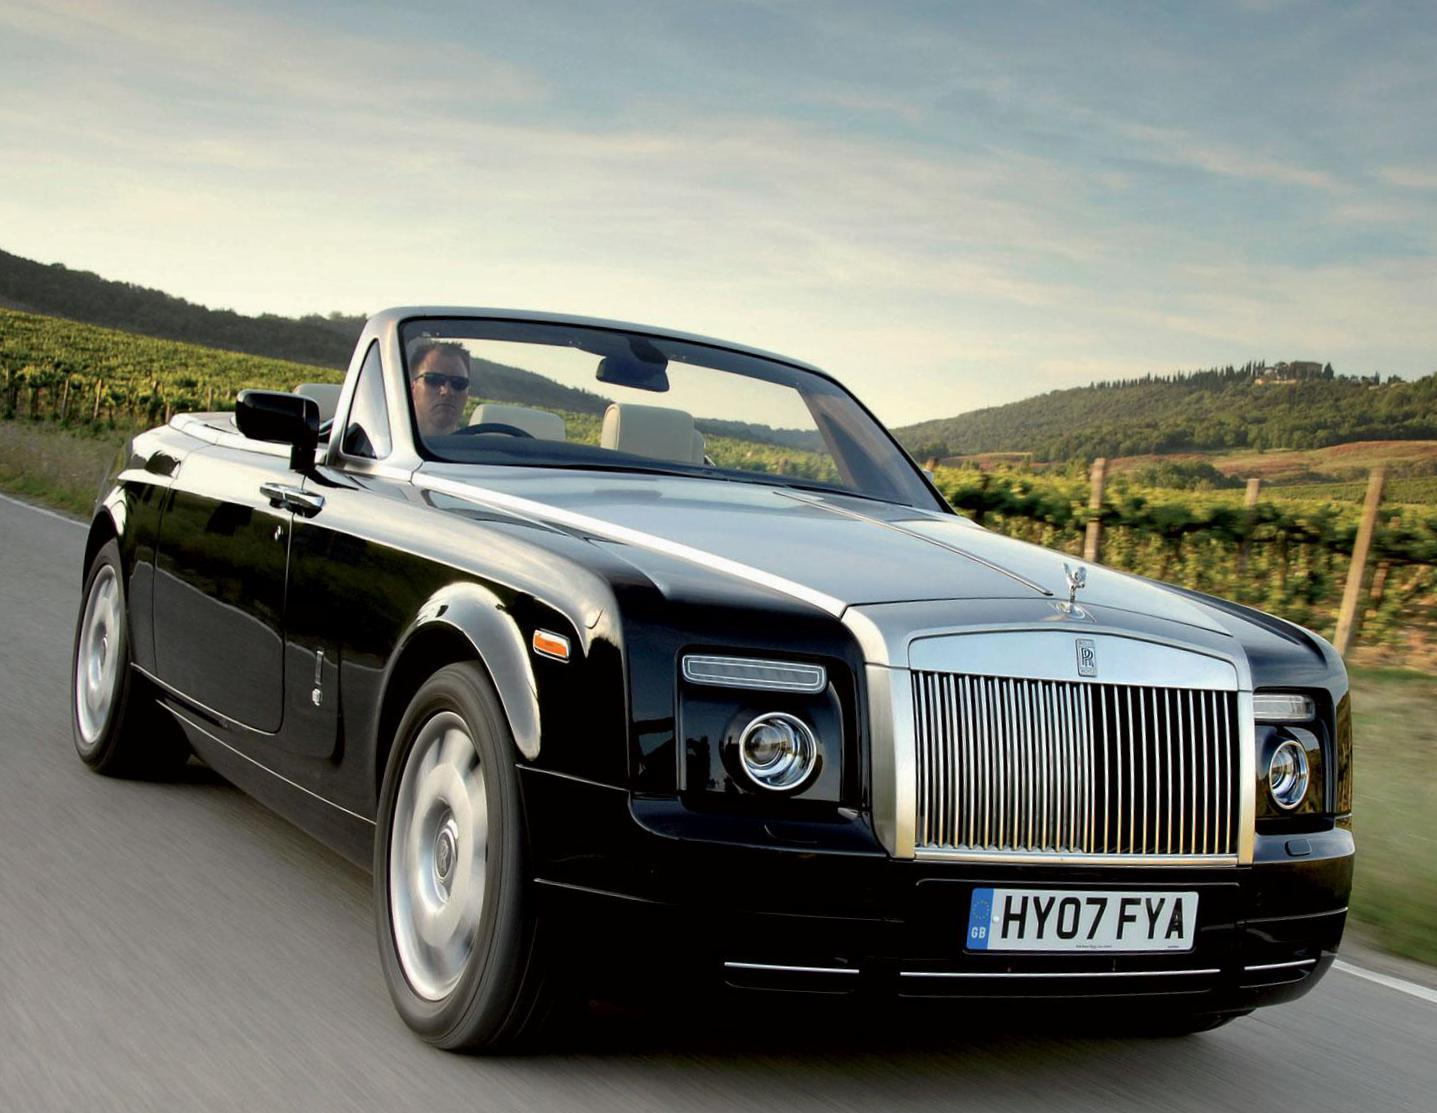 Rolls Royce Phantom Drophead Coupe Cost Suv